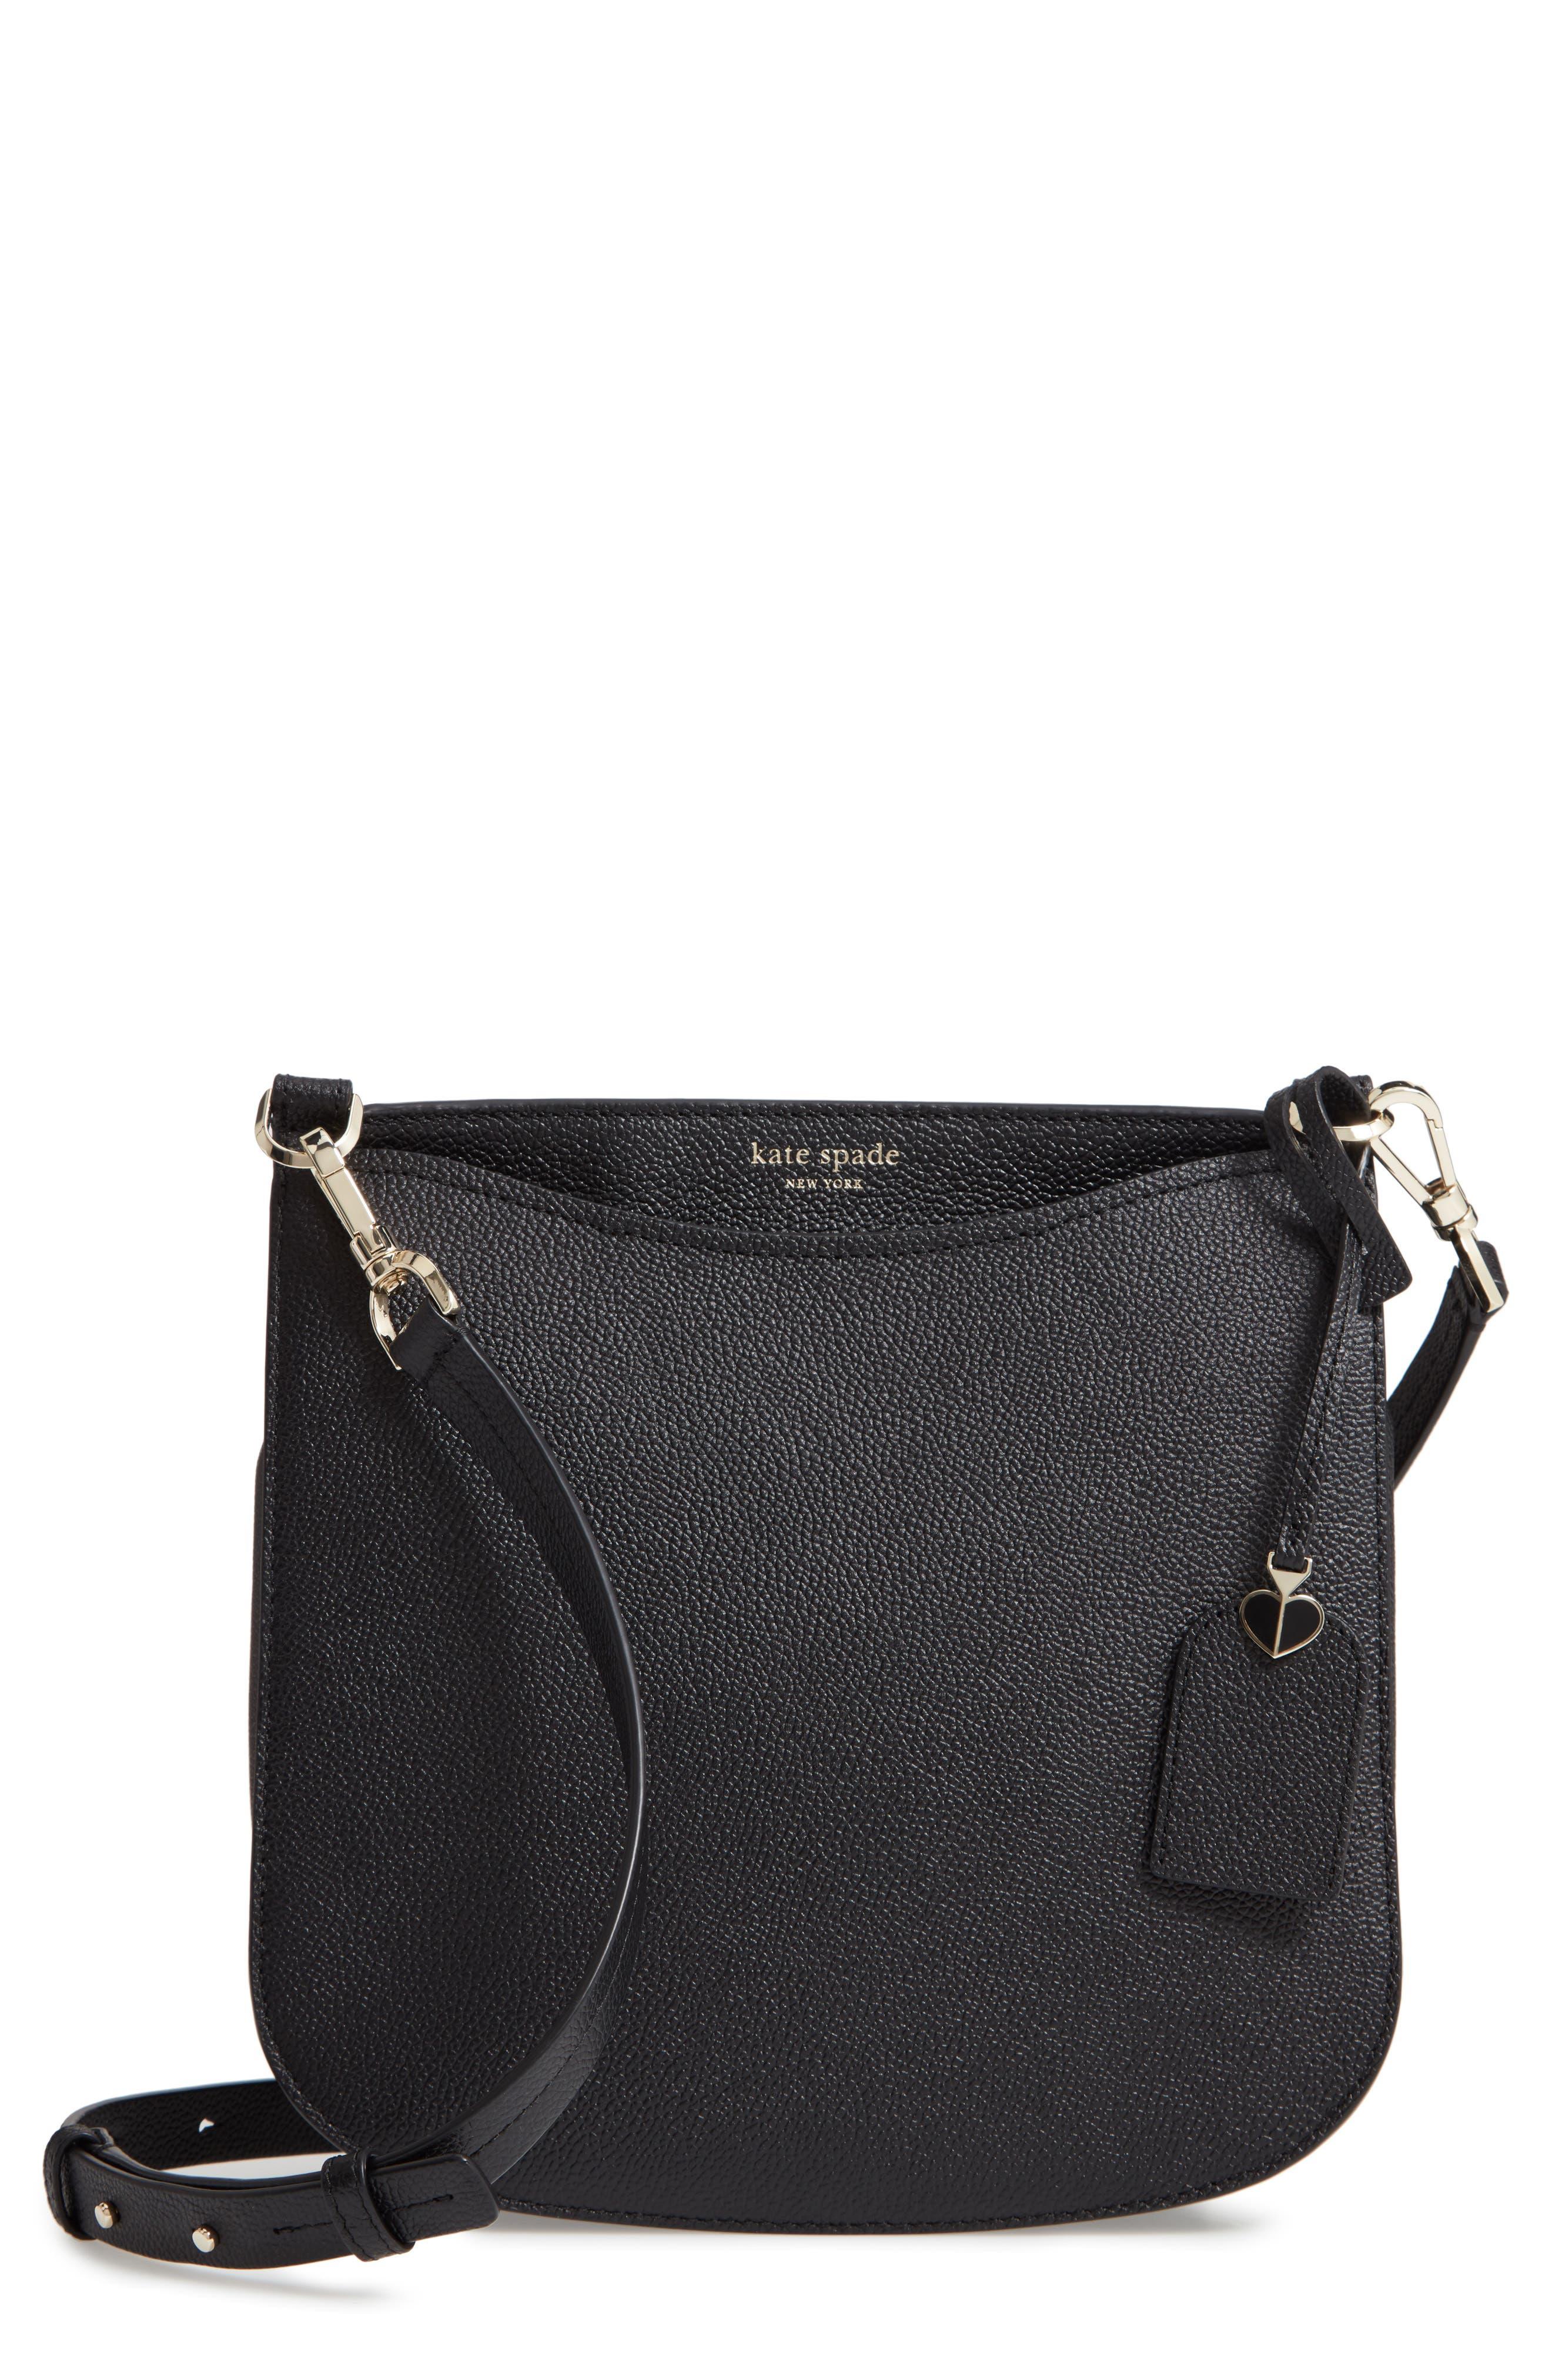 KATE SPADE NEW YORK,                             margaux large crossbody bag,                             Main thumbnail 1, color,                             BLACK